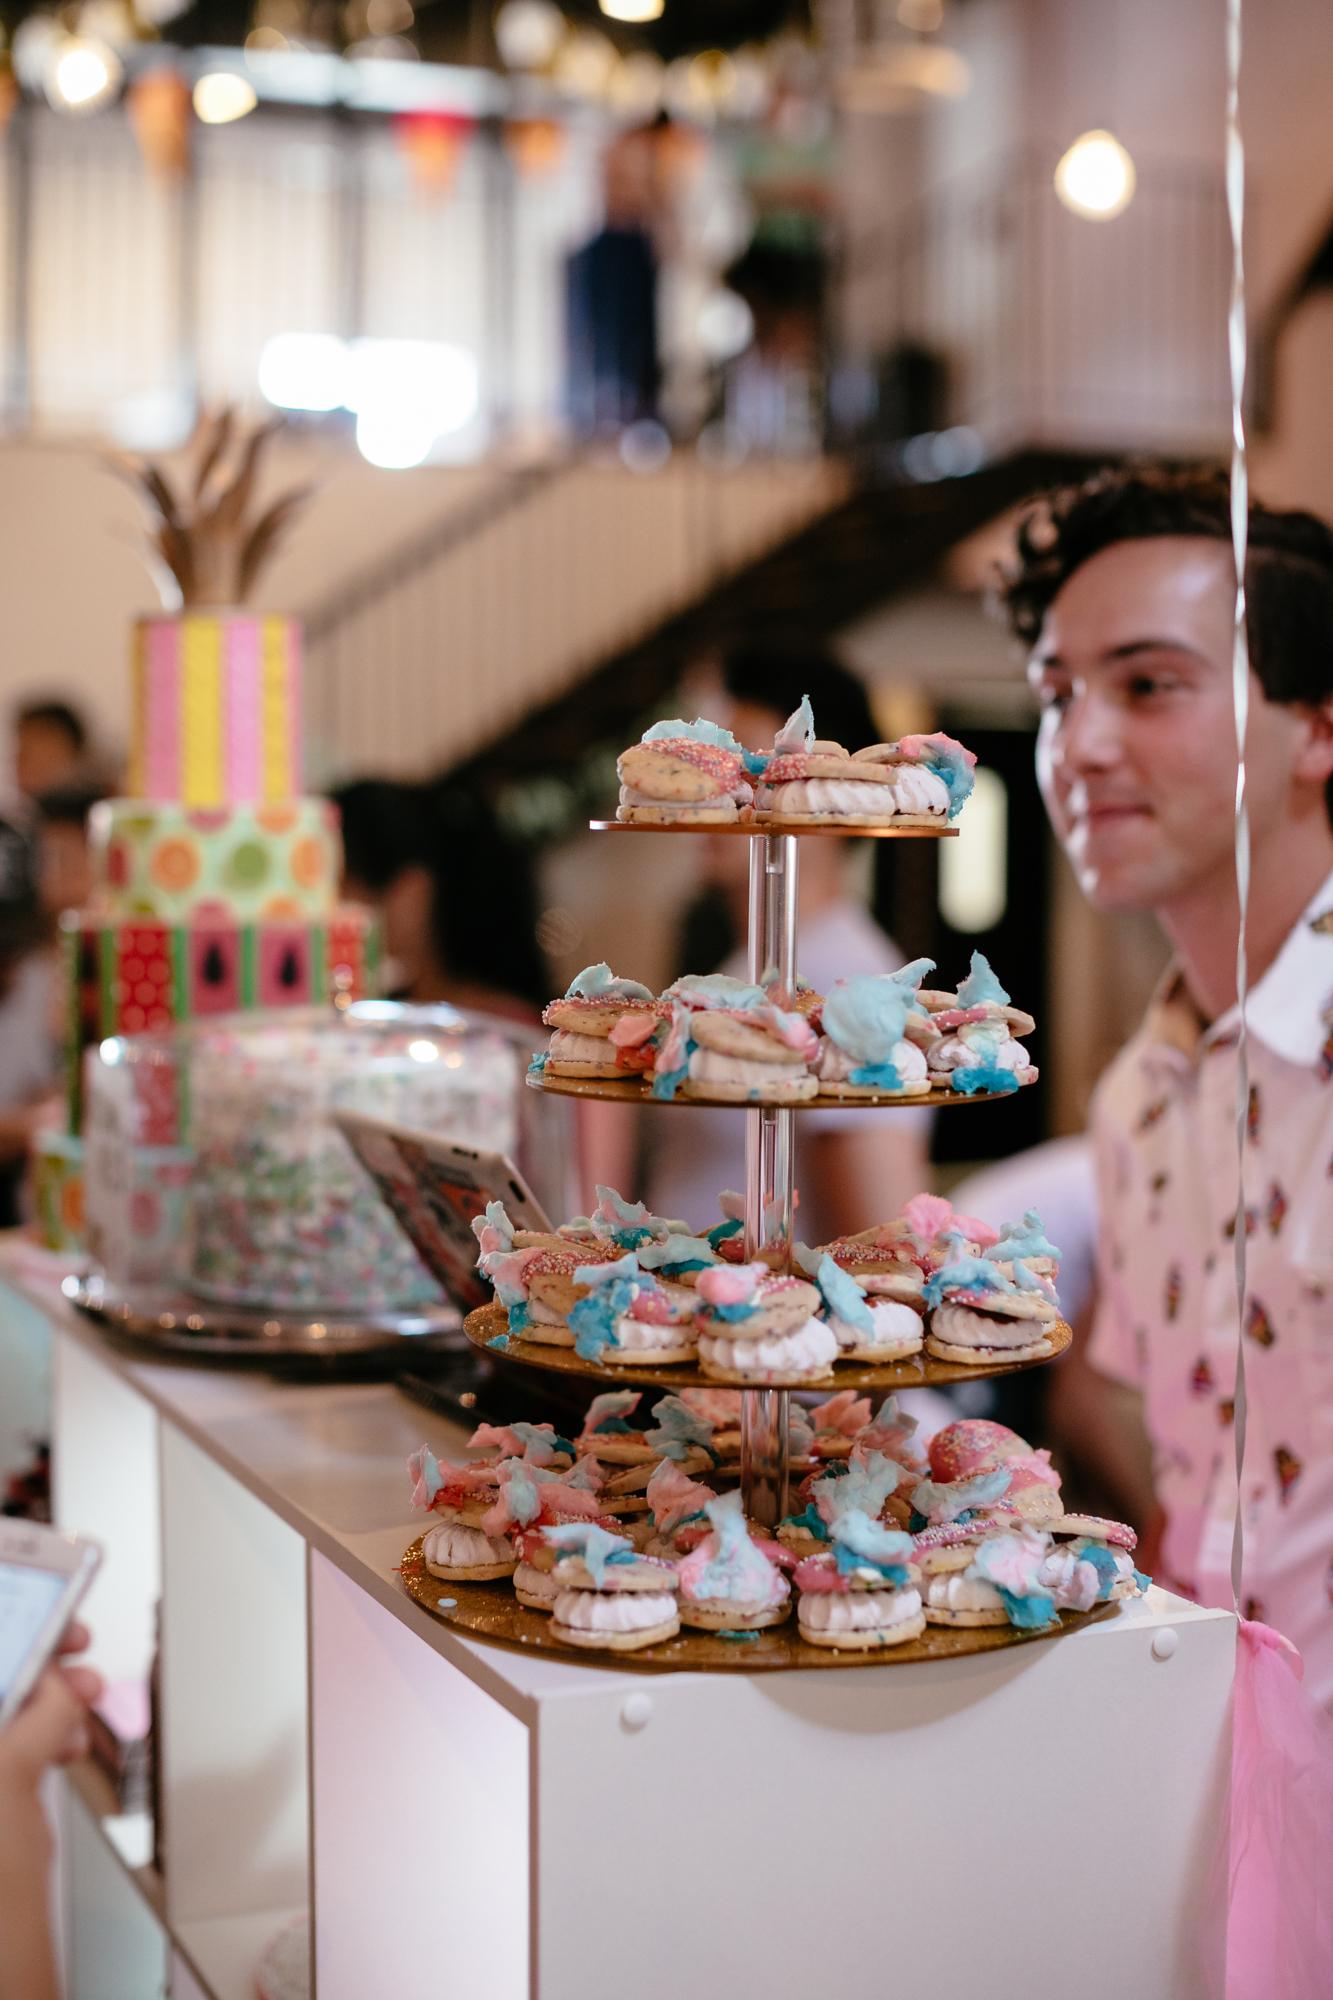 Sweet treats abound at Dessert Goals.